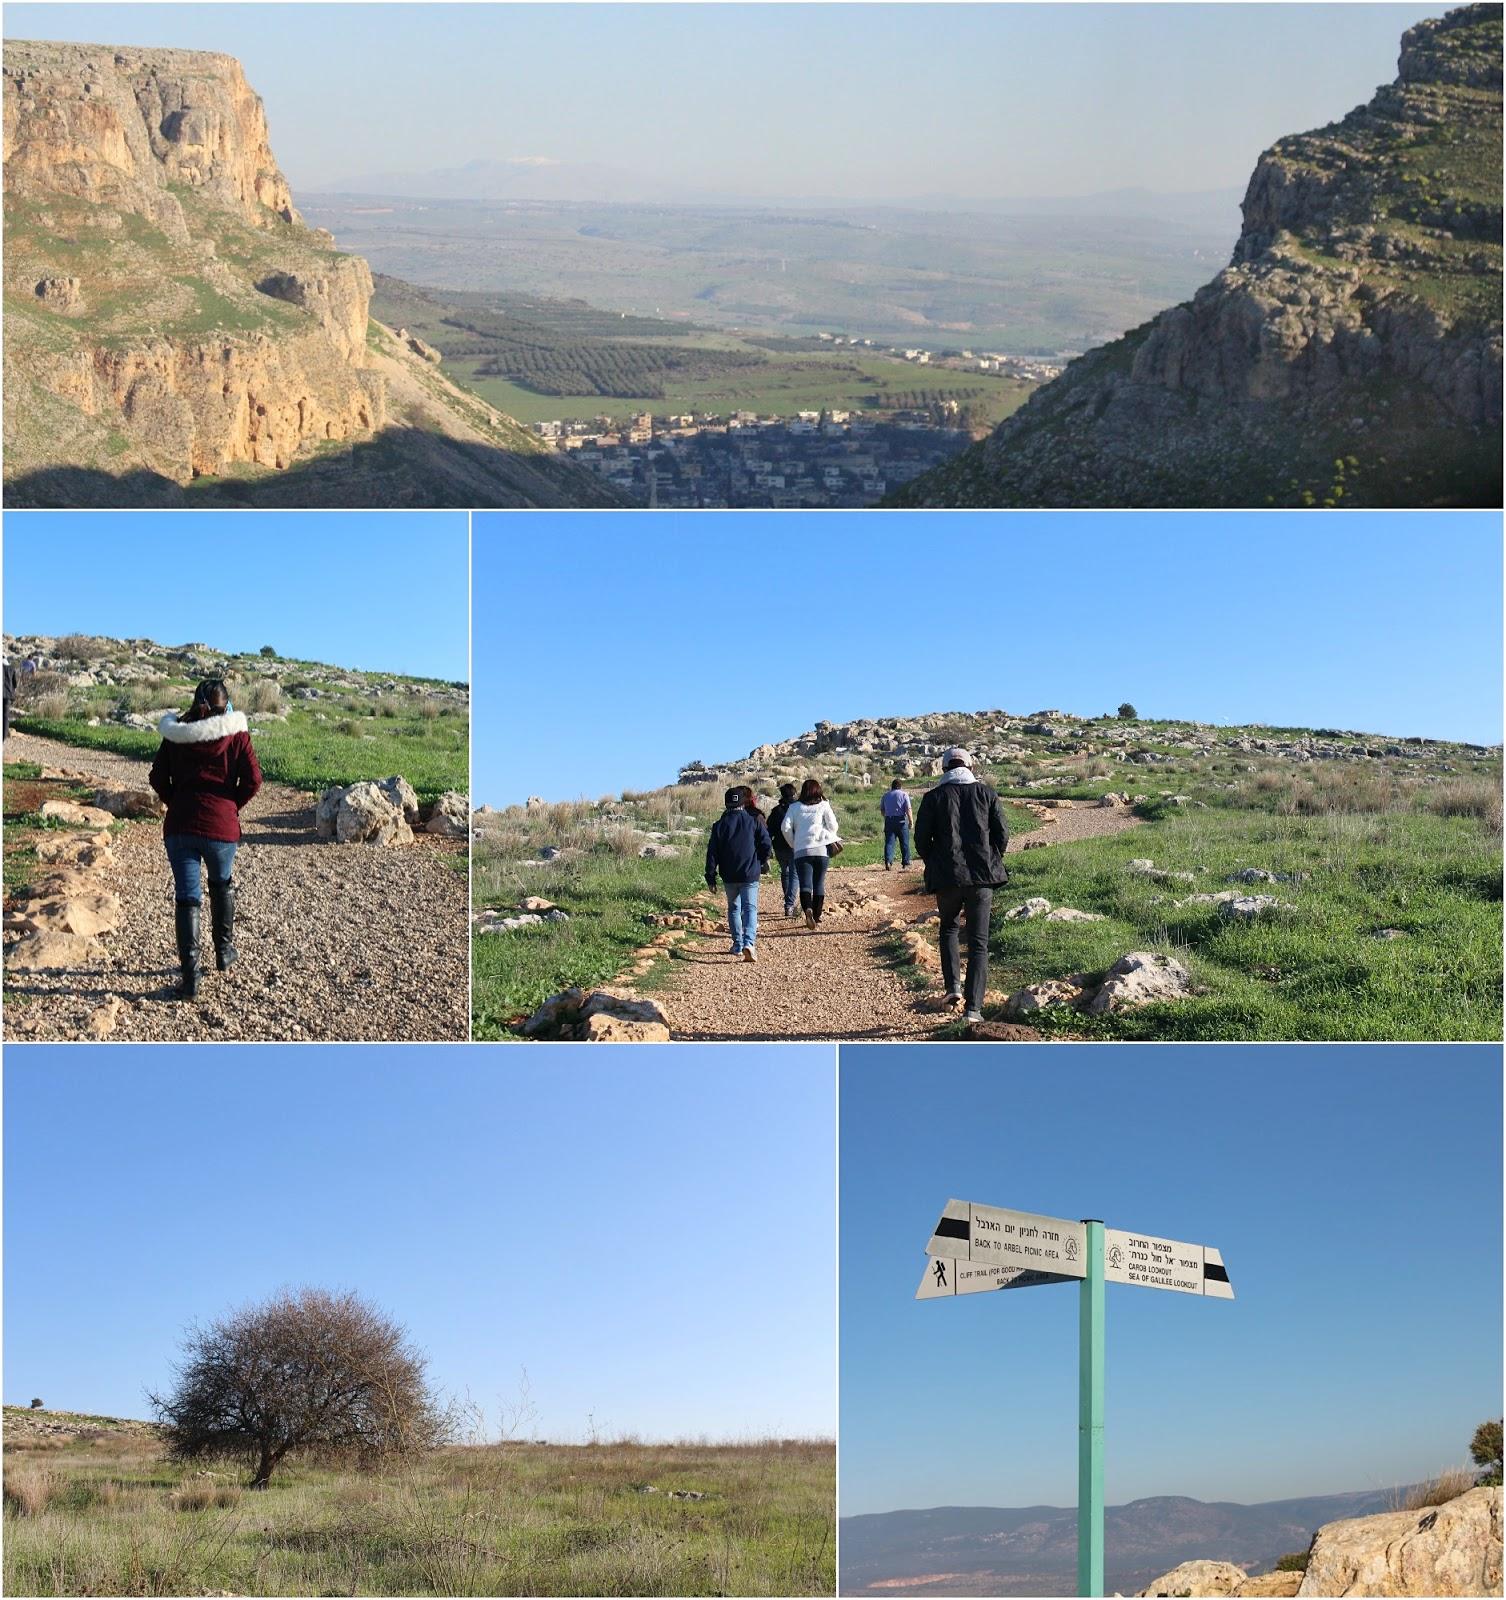 Mount Arbel: Things To Do in Israel